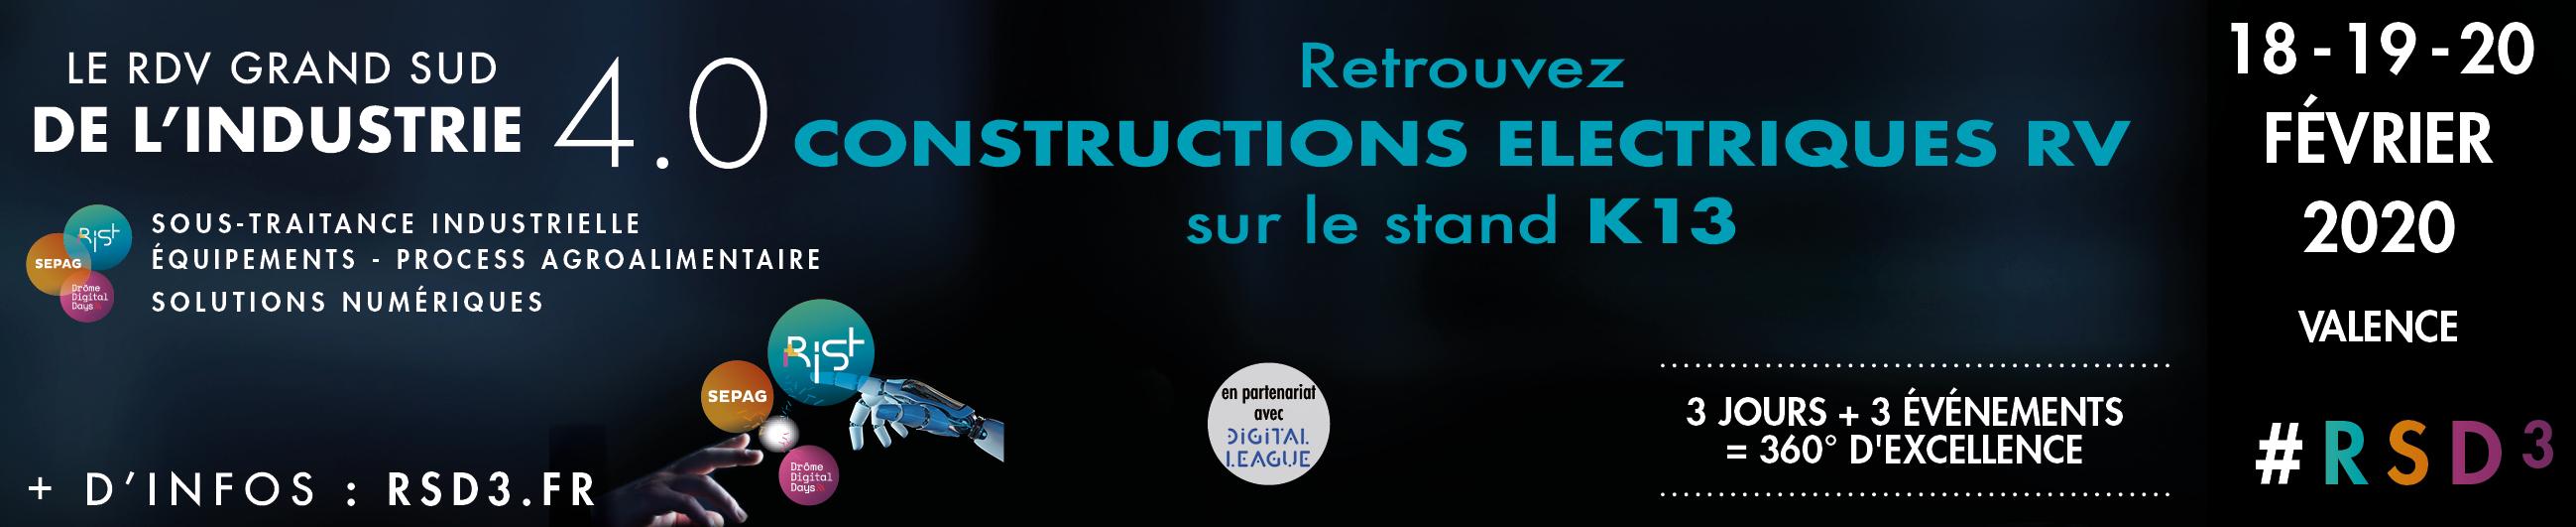 CONSTRUCTIONS ELECTRIQUES RV RIST